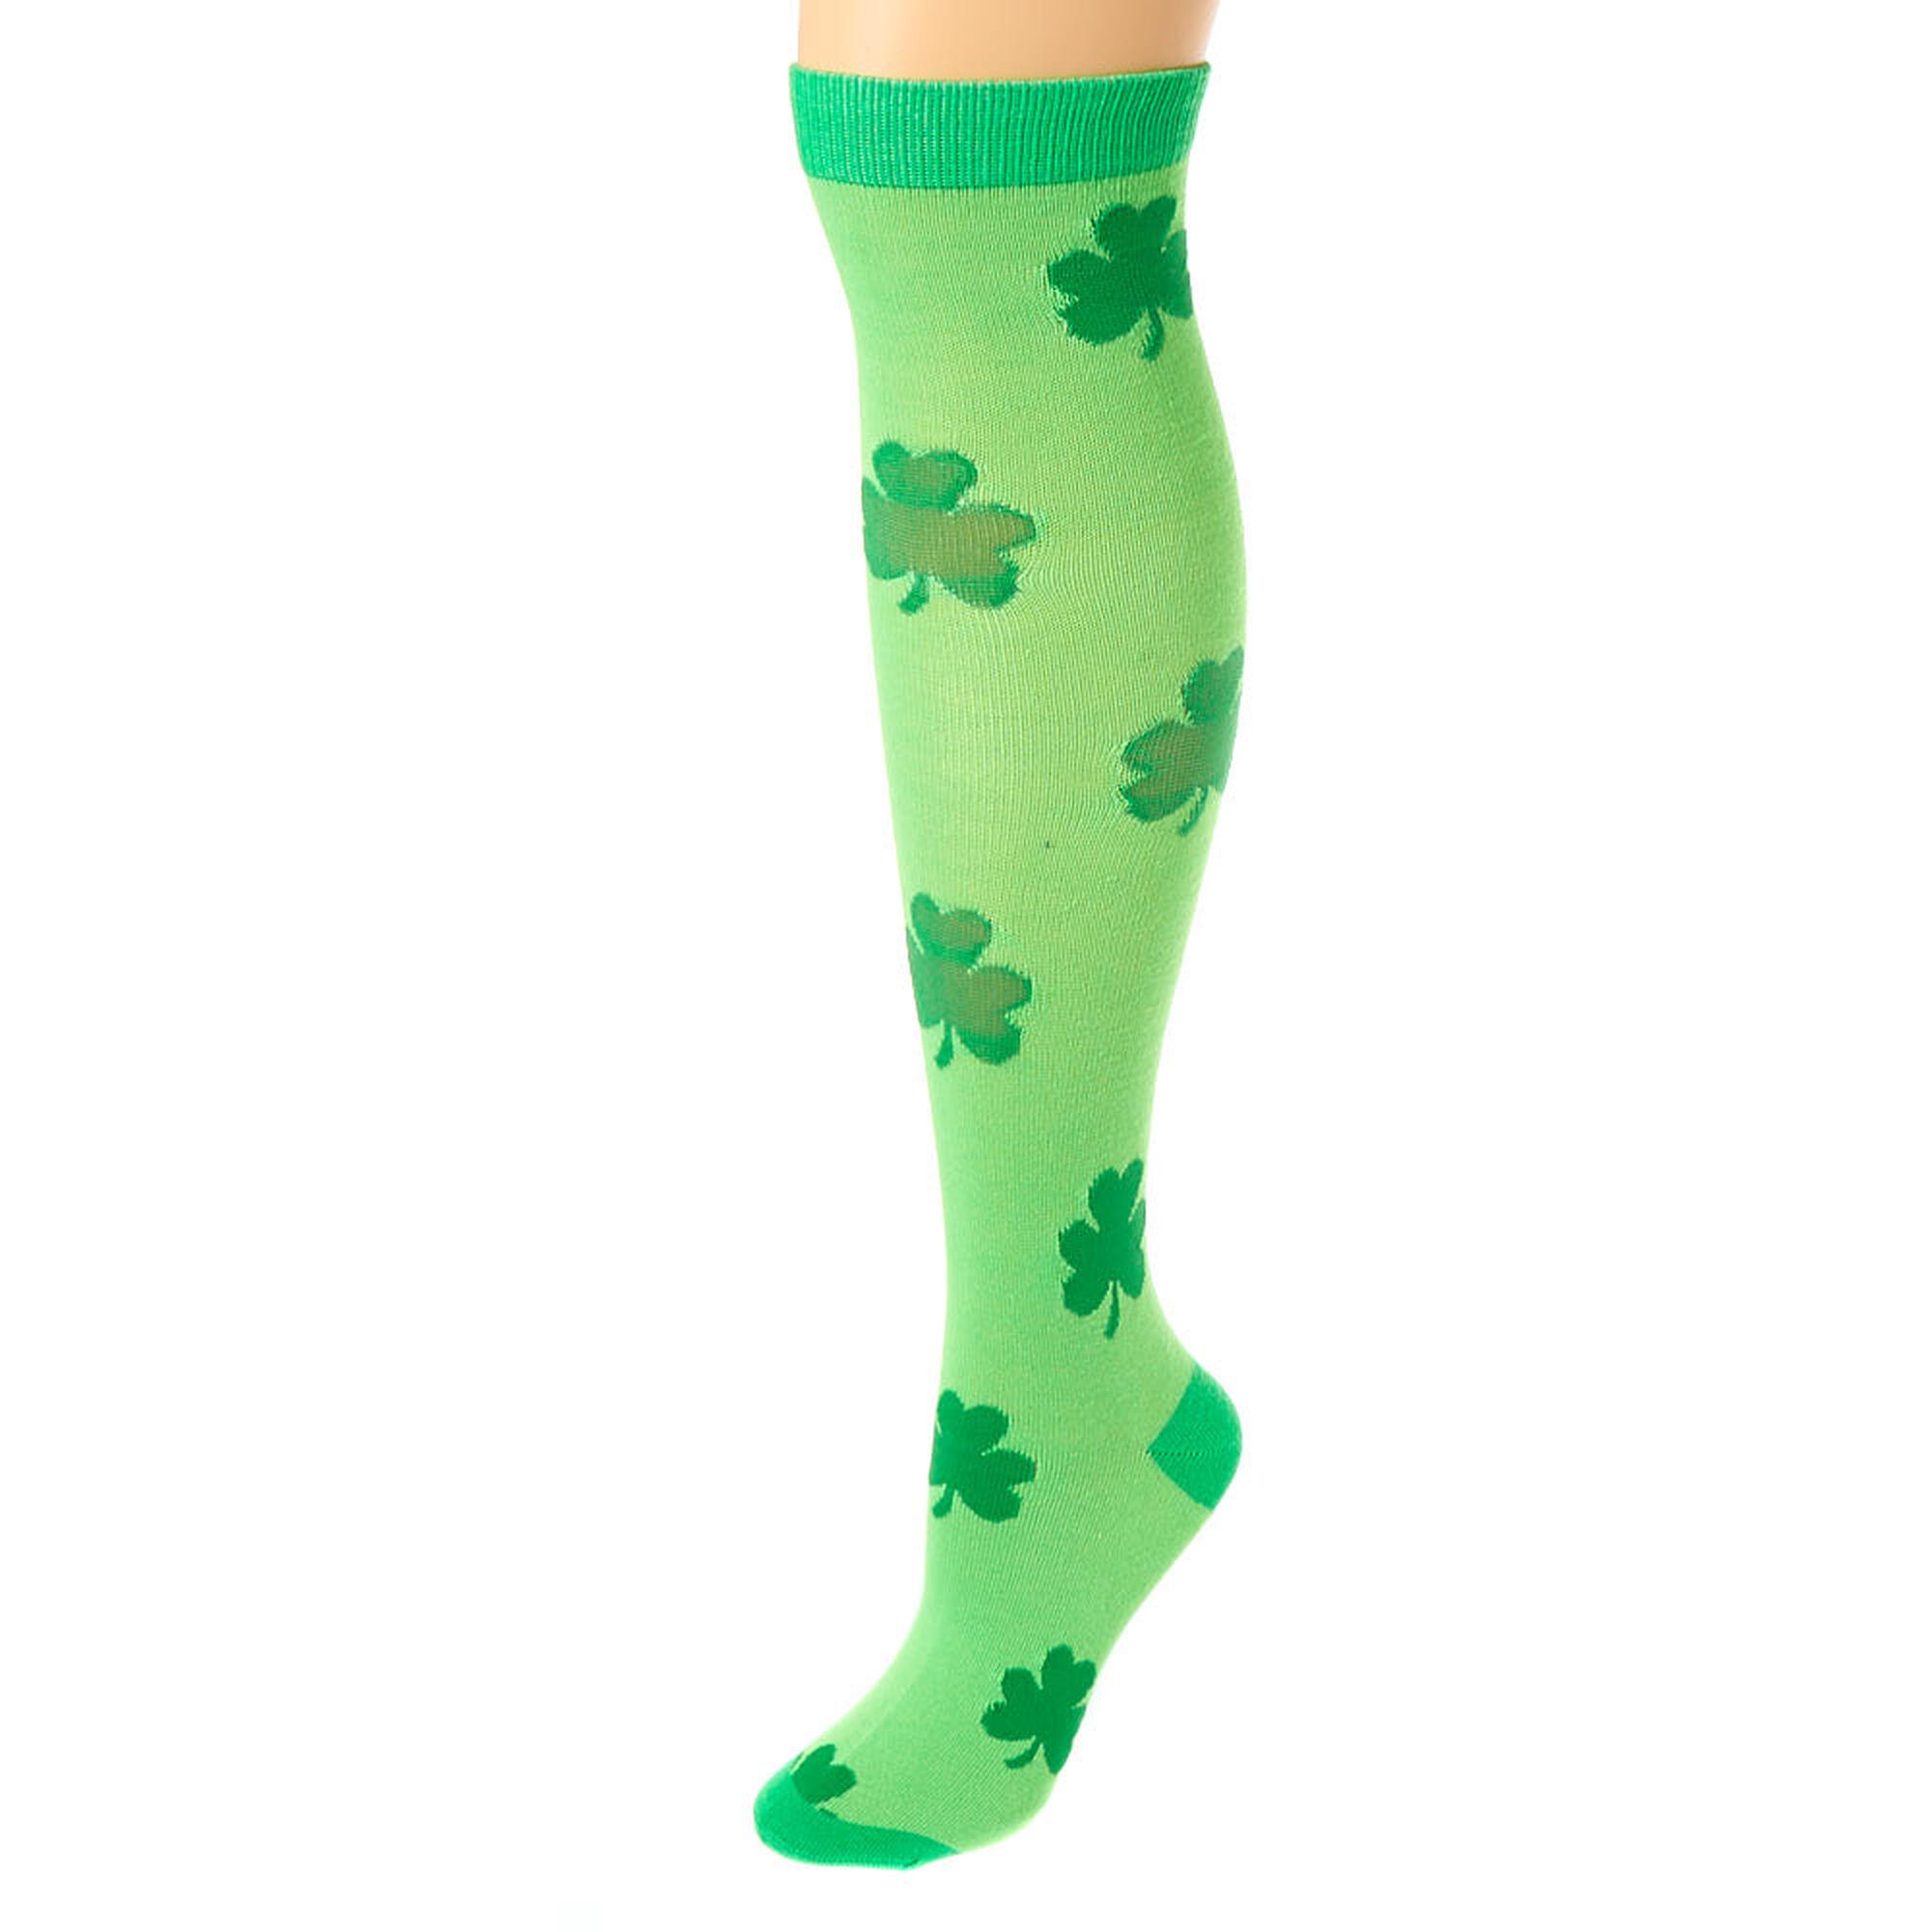 35a8d136f55 Neon Shamrock Knee High Socks - Green